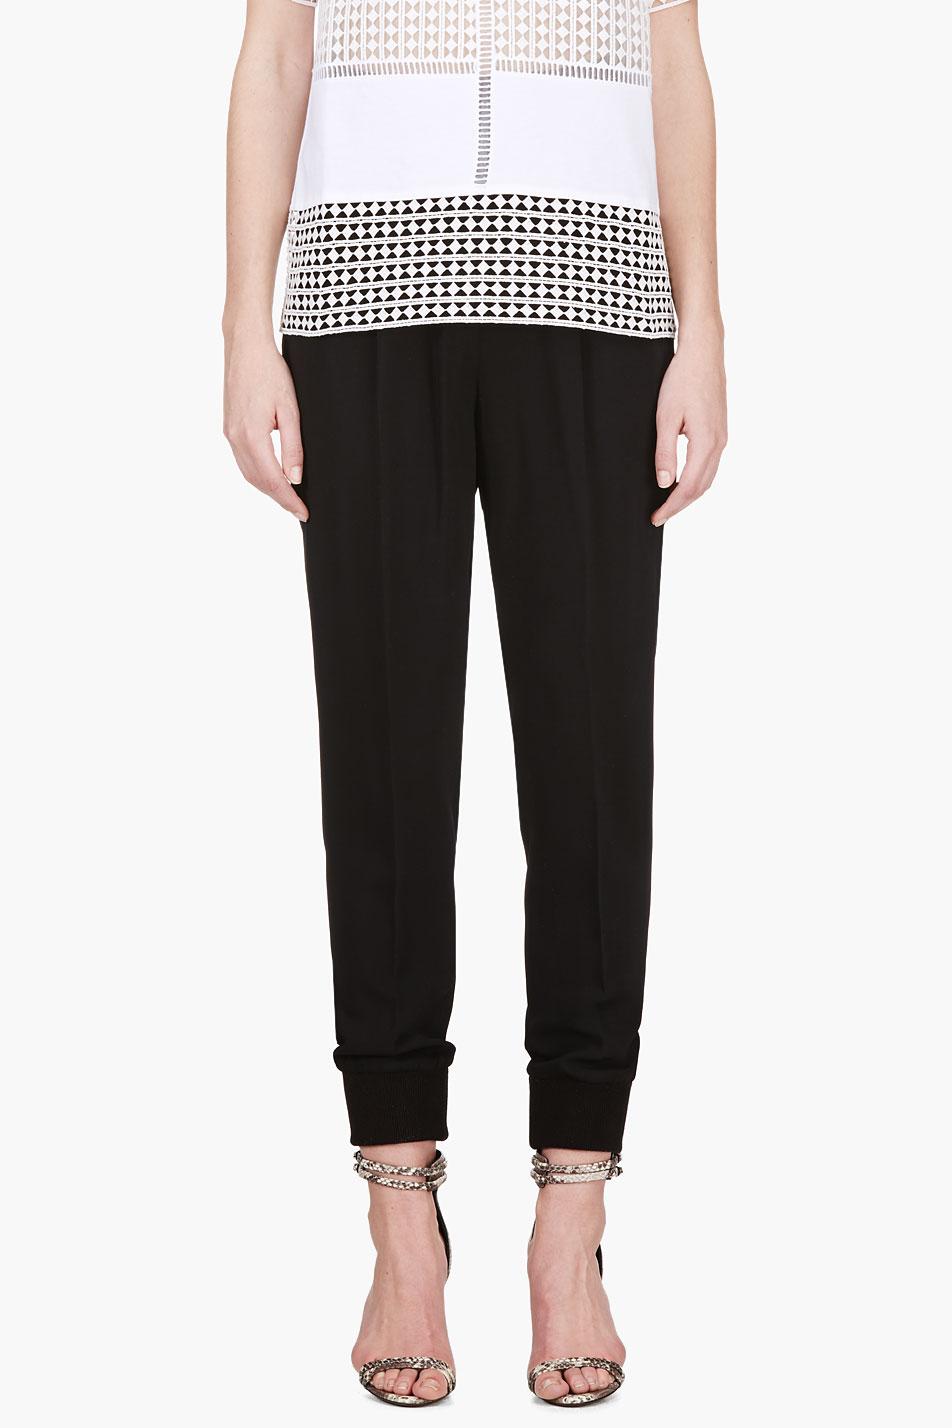 Giambattista valli black pleated harem trousers